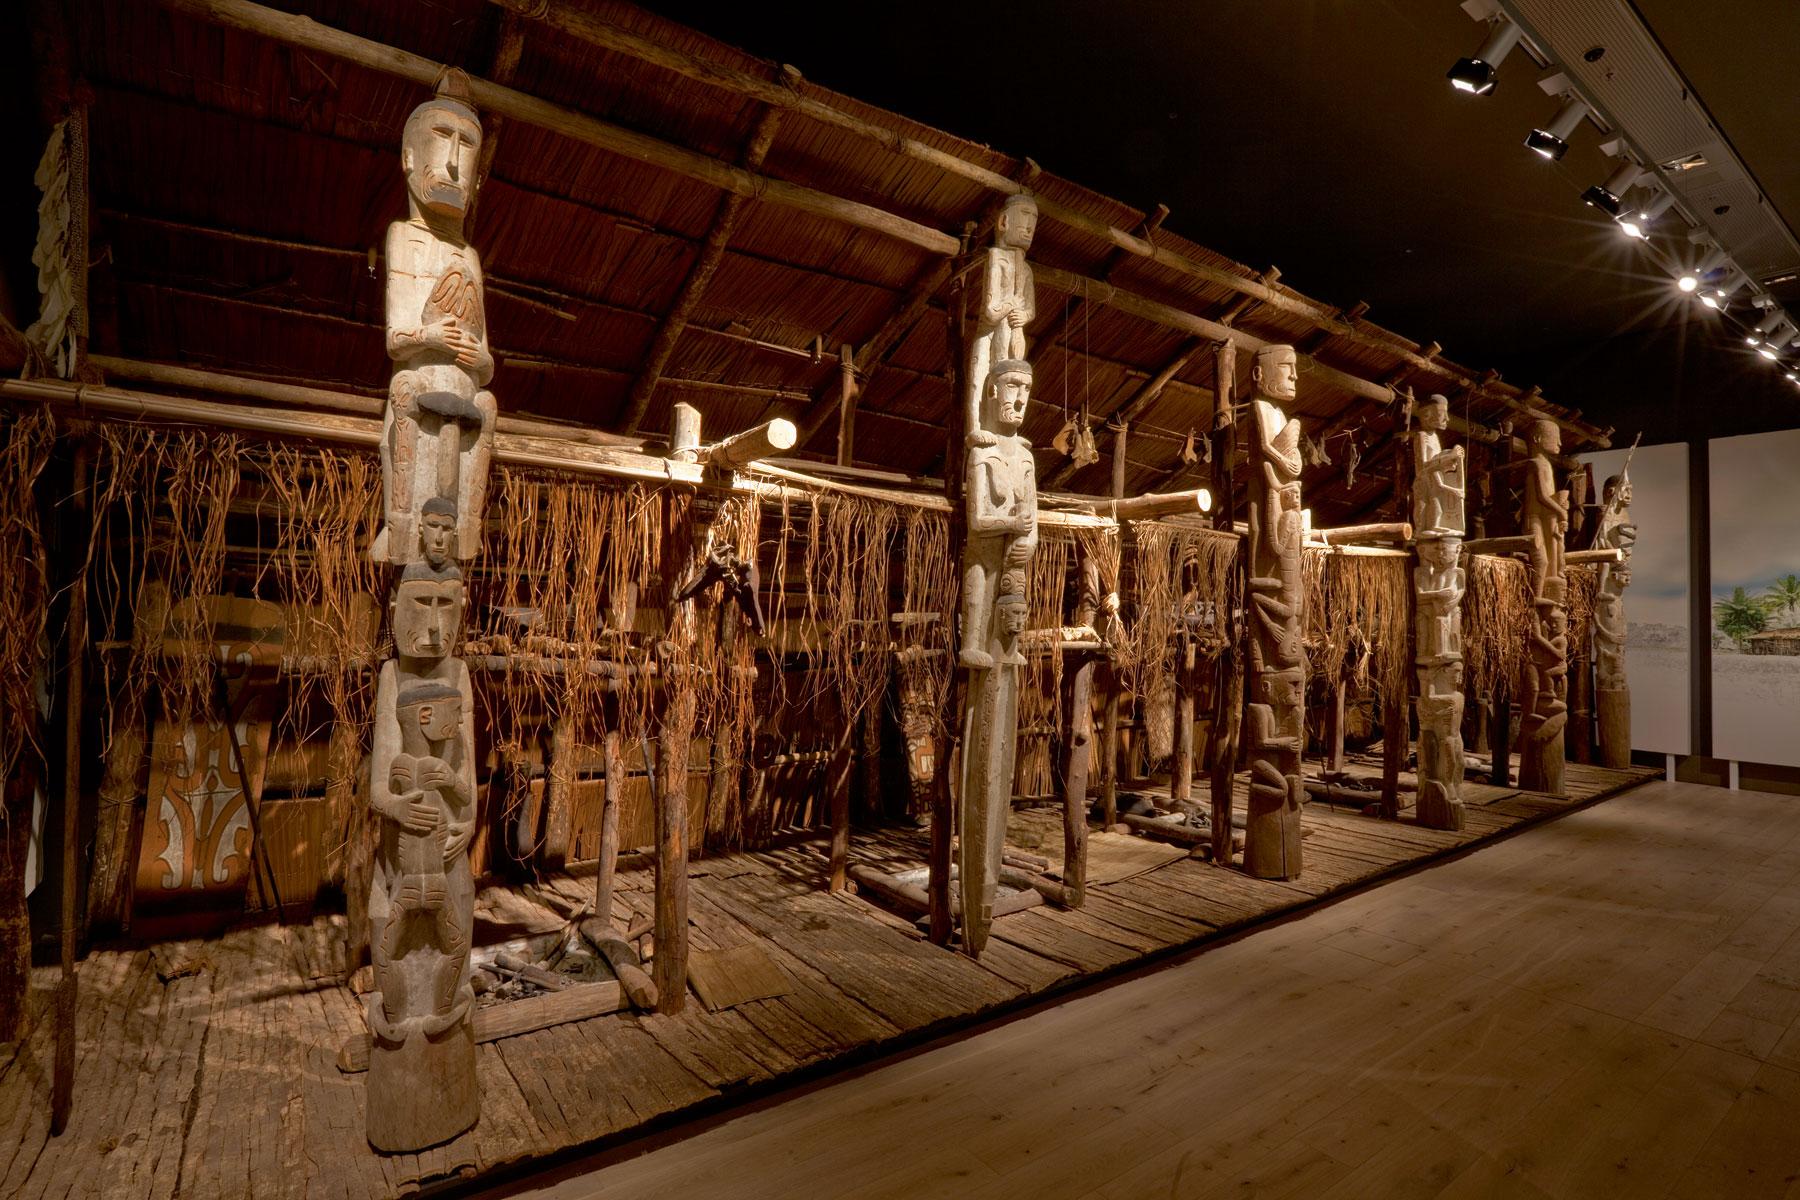 Männerhaus der Asmat aus der Dorfschaft Atjs, West-Neuguinea, Melanesien, Rautenstrauch-Joest-Museum, Köln